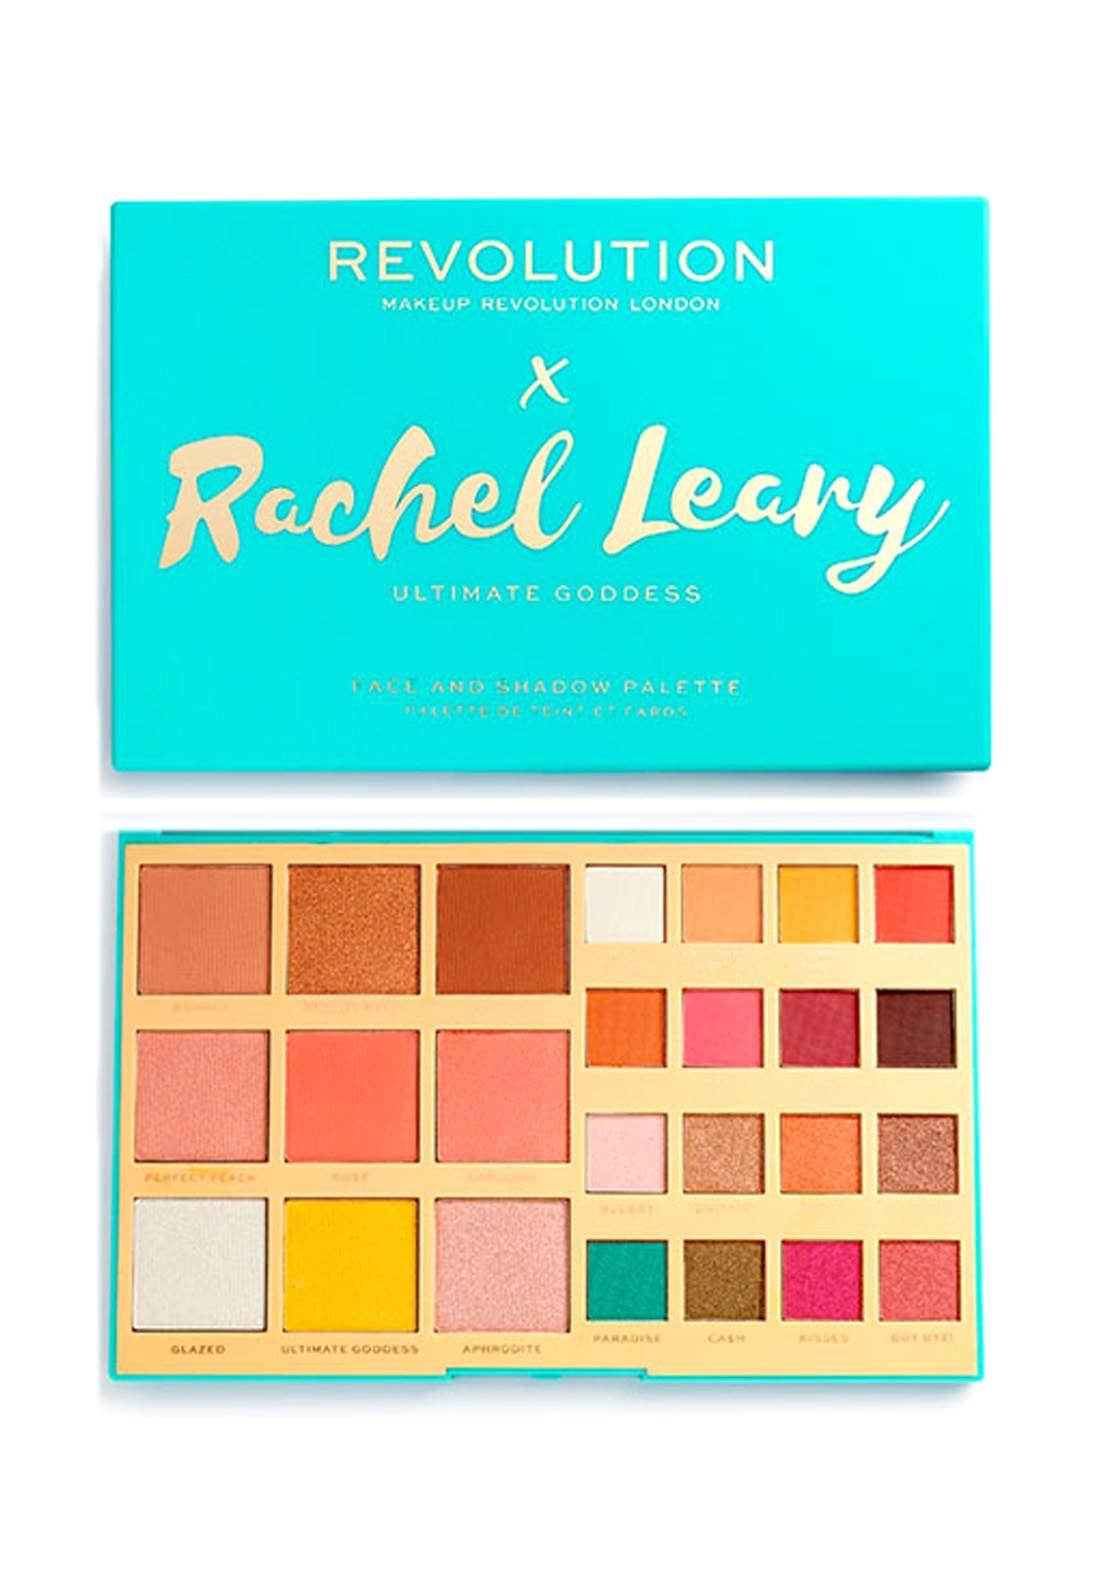 Revolution Rachel Leary X Eyeshadow Palette - Ultimate Goddess 0.8 G باليت